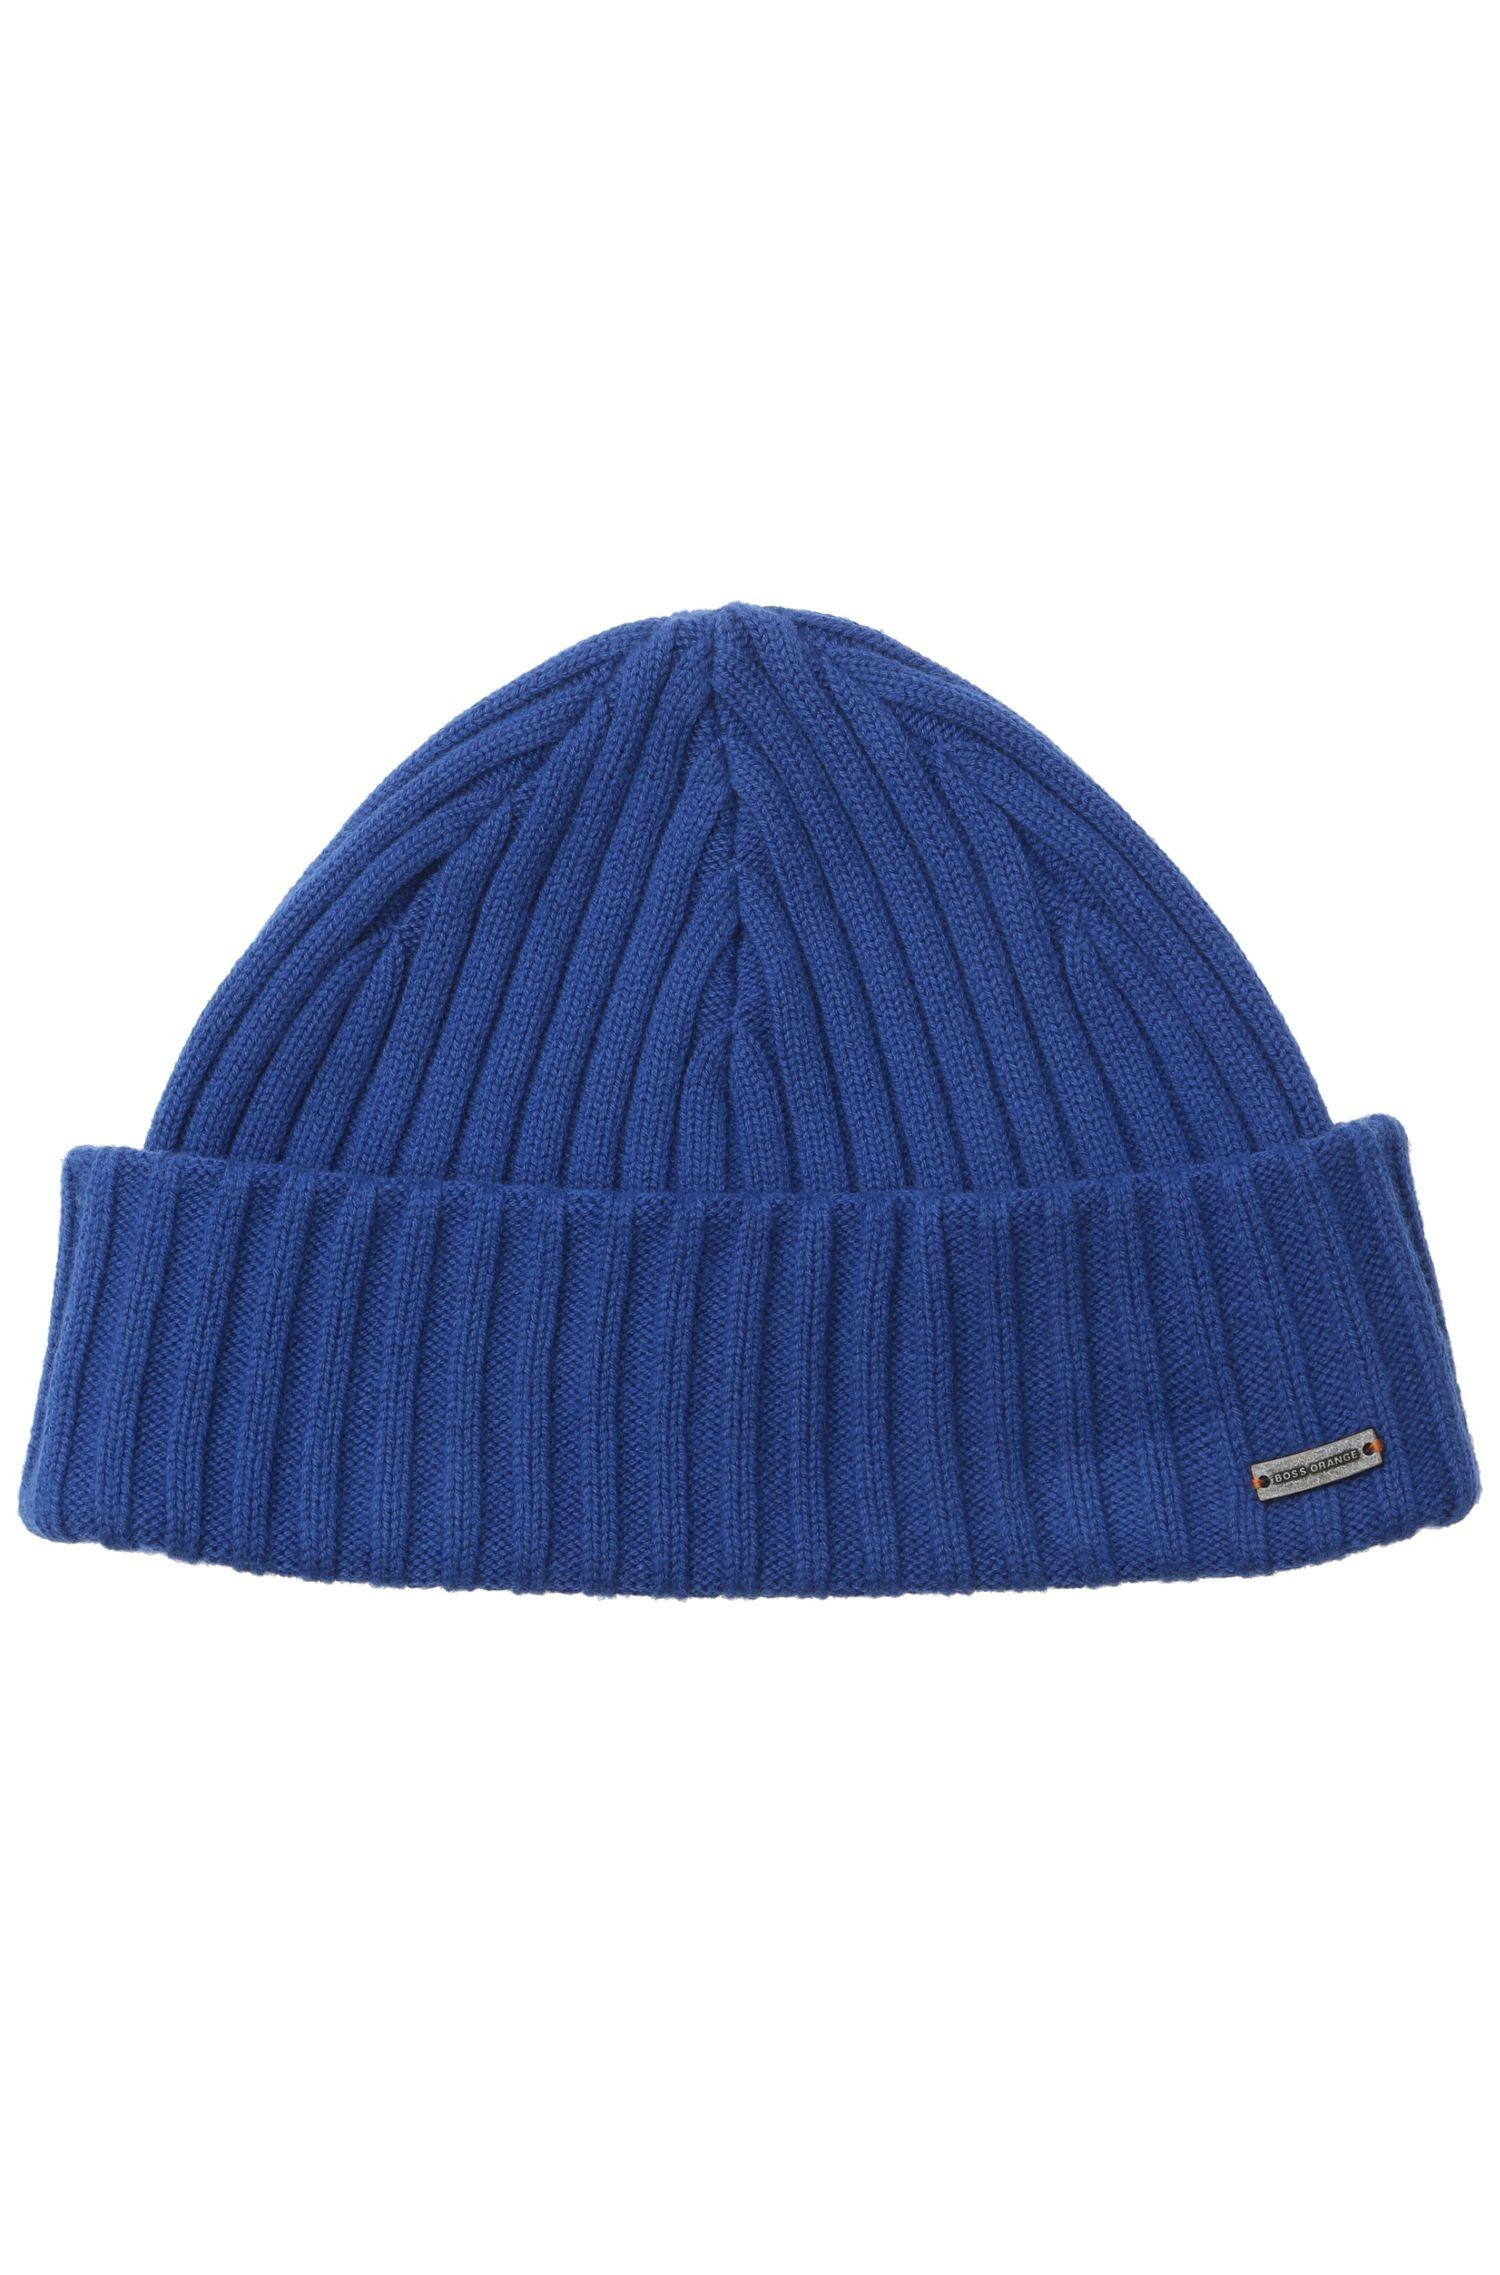 Mütze ´Araffon` aus Rippstrick